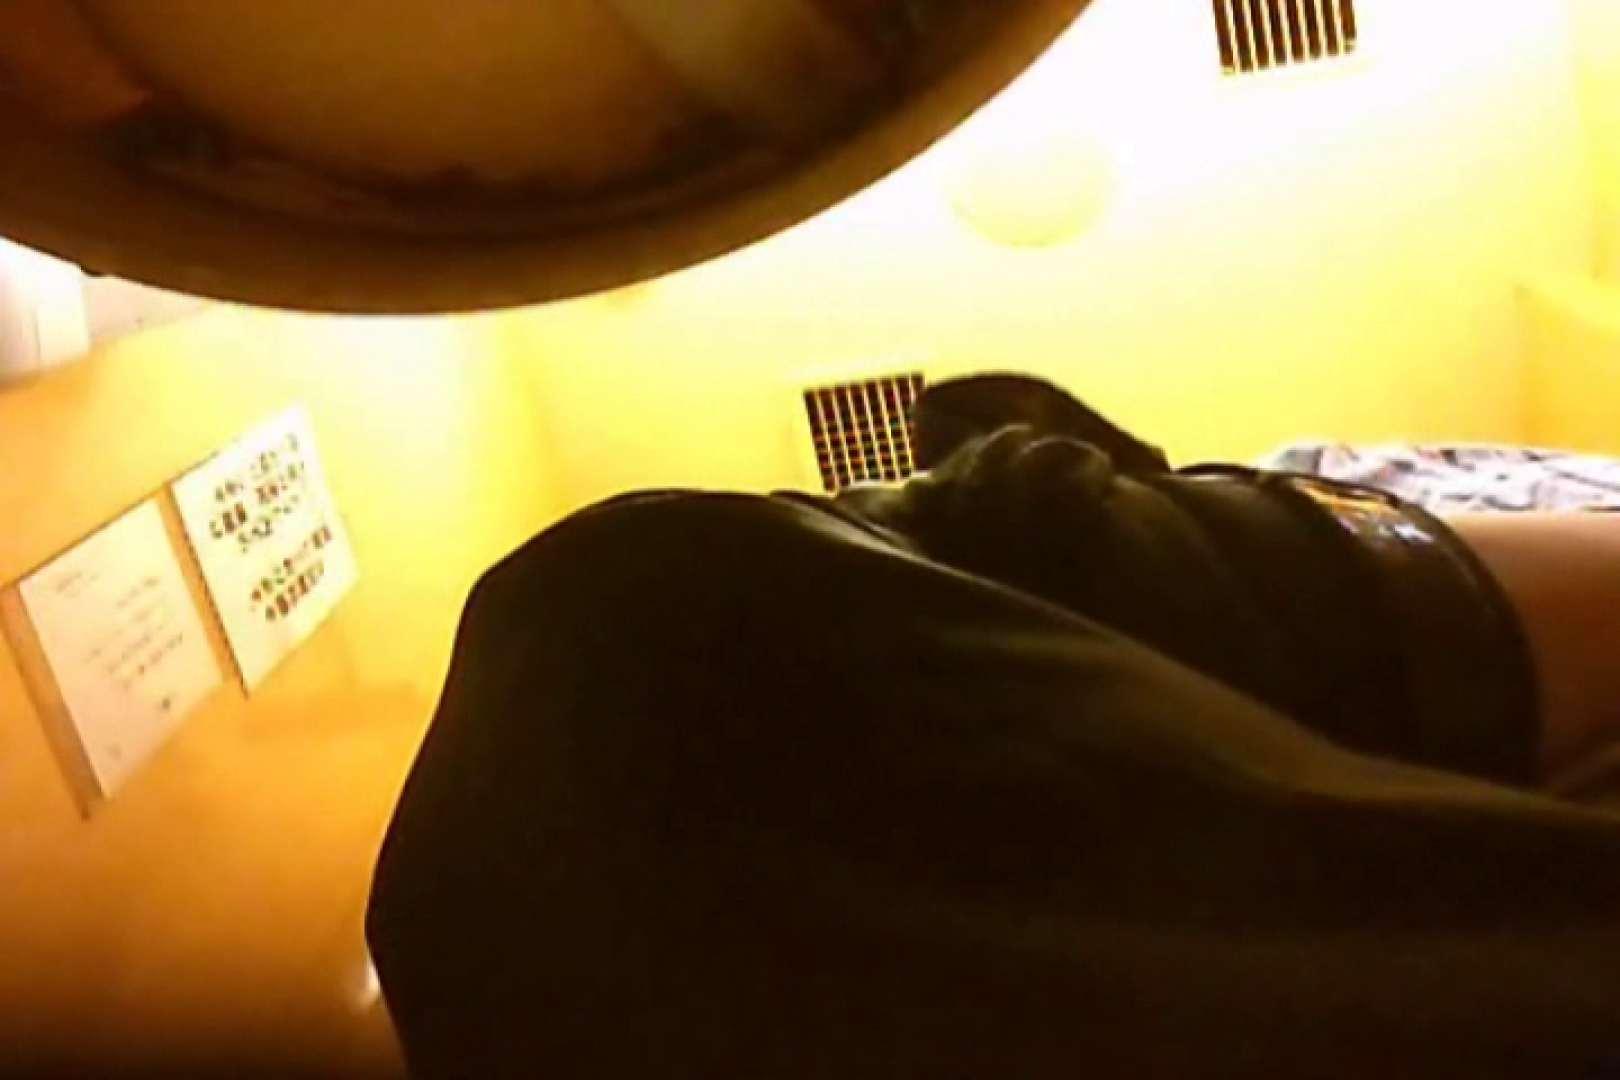 SEASON 3rd!掴み取りさんの洗面所覗き!in新幹線!VOL.09 完全無修正版 ゲイ流出動画キャプチャ 108枚 107